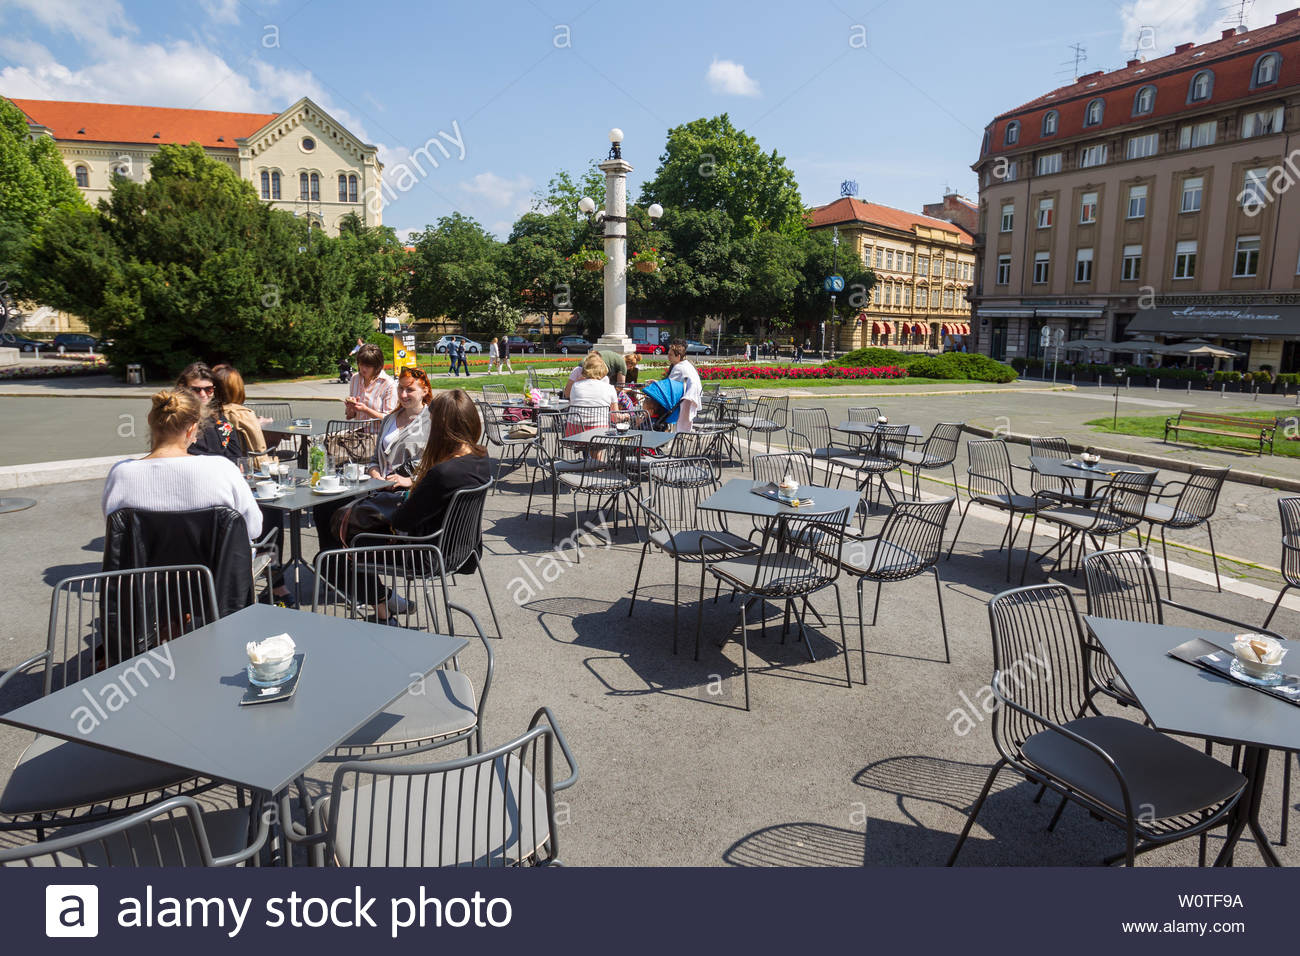 ZAGREB, CROATIA - MAY 19, 2018 : People sitting on the coffee bar terrace of Croatian National Theater in Zagreb, Croatia. Stock Photo